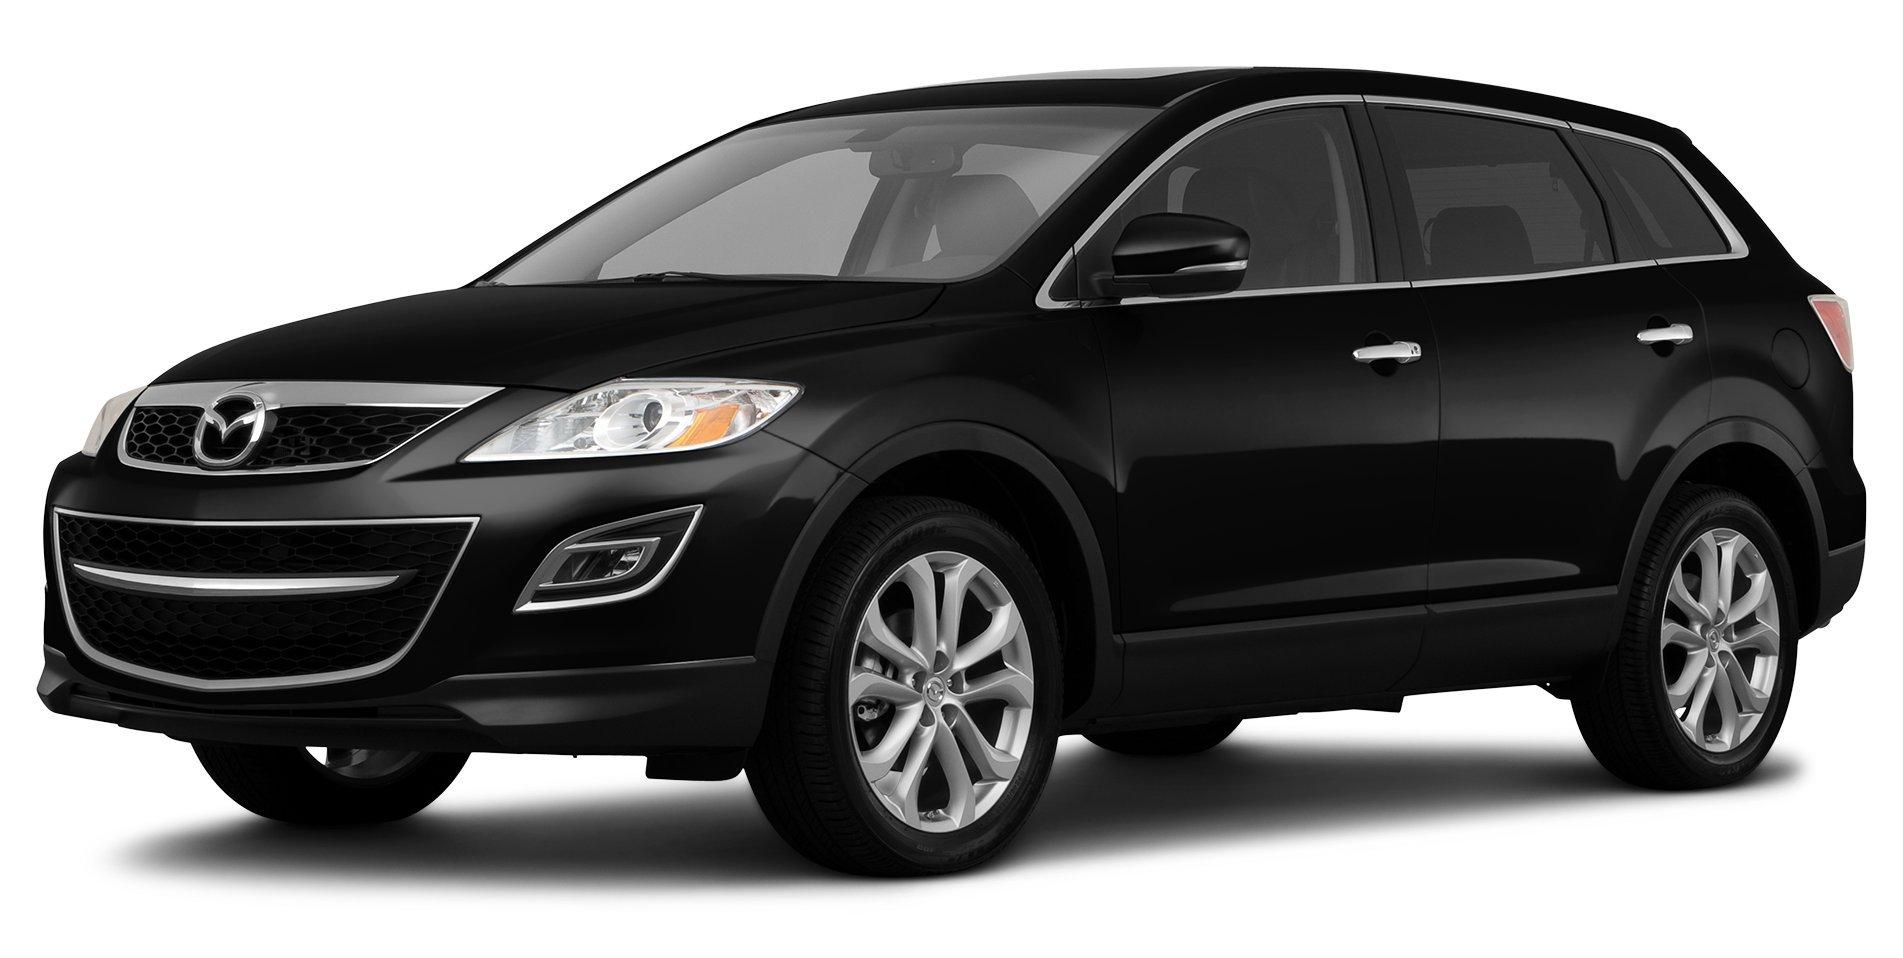 Kelebihan Mazda Cx 9 2011 Harga